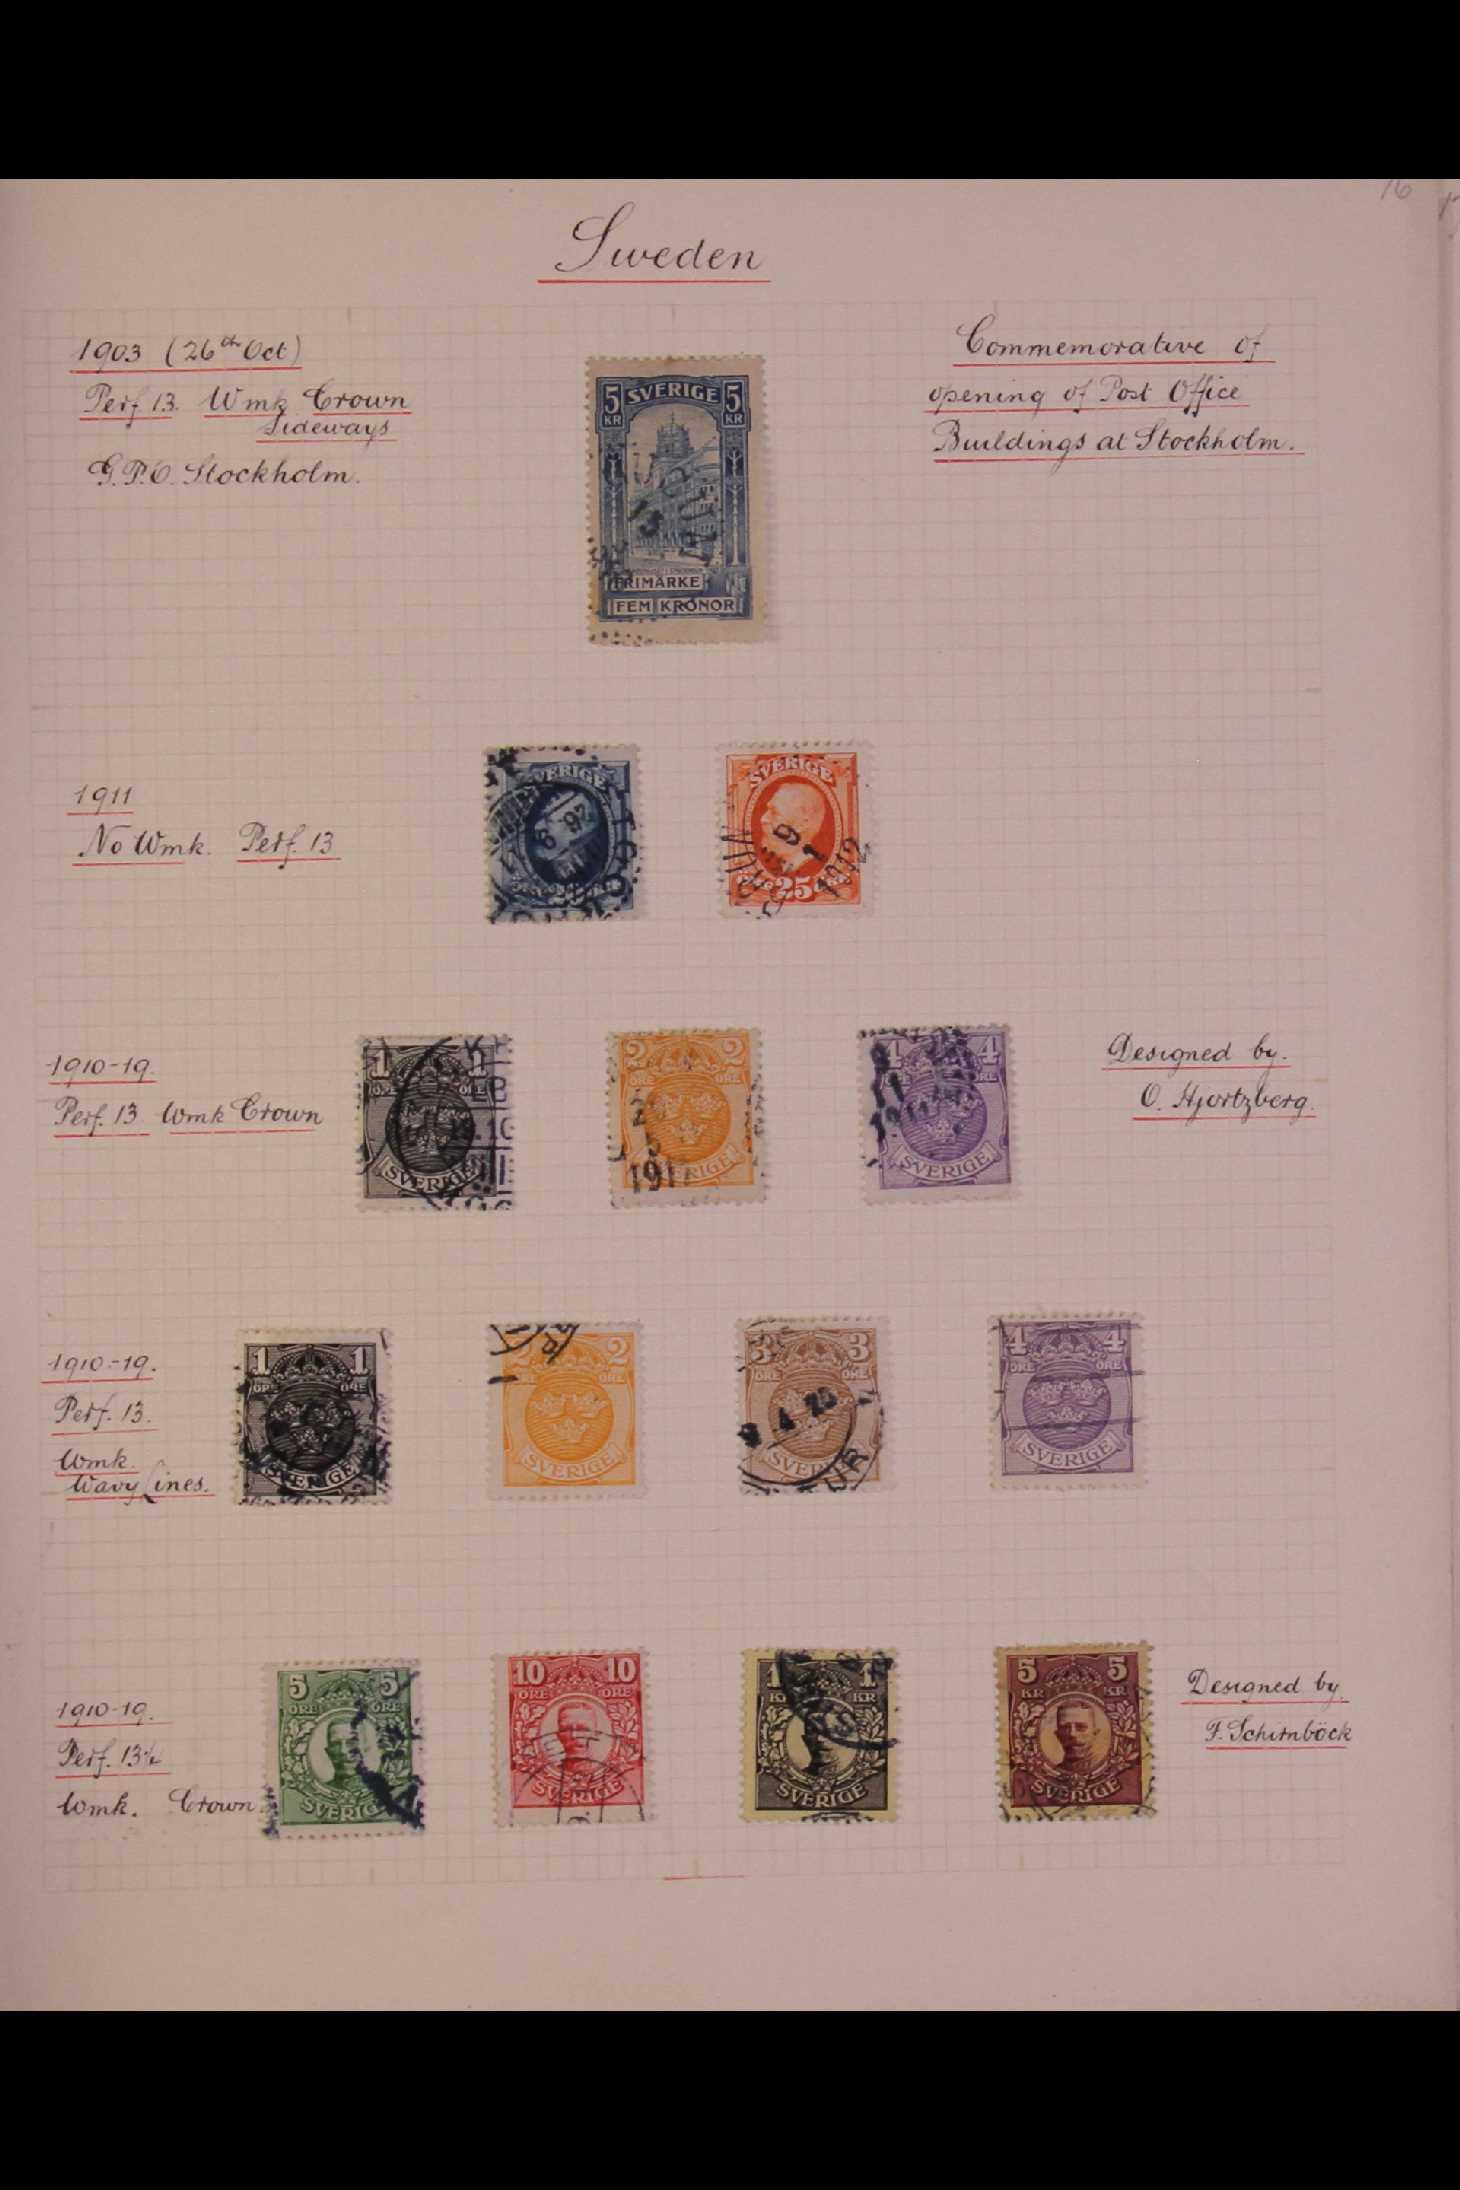 SWEDEN 1903-1966 USED COLLECTION incl. 1903 5k GPO, 1910-19 wmk Crown set, 1916 Landstorm surcharges